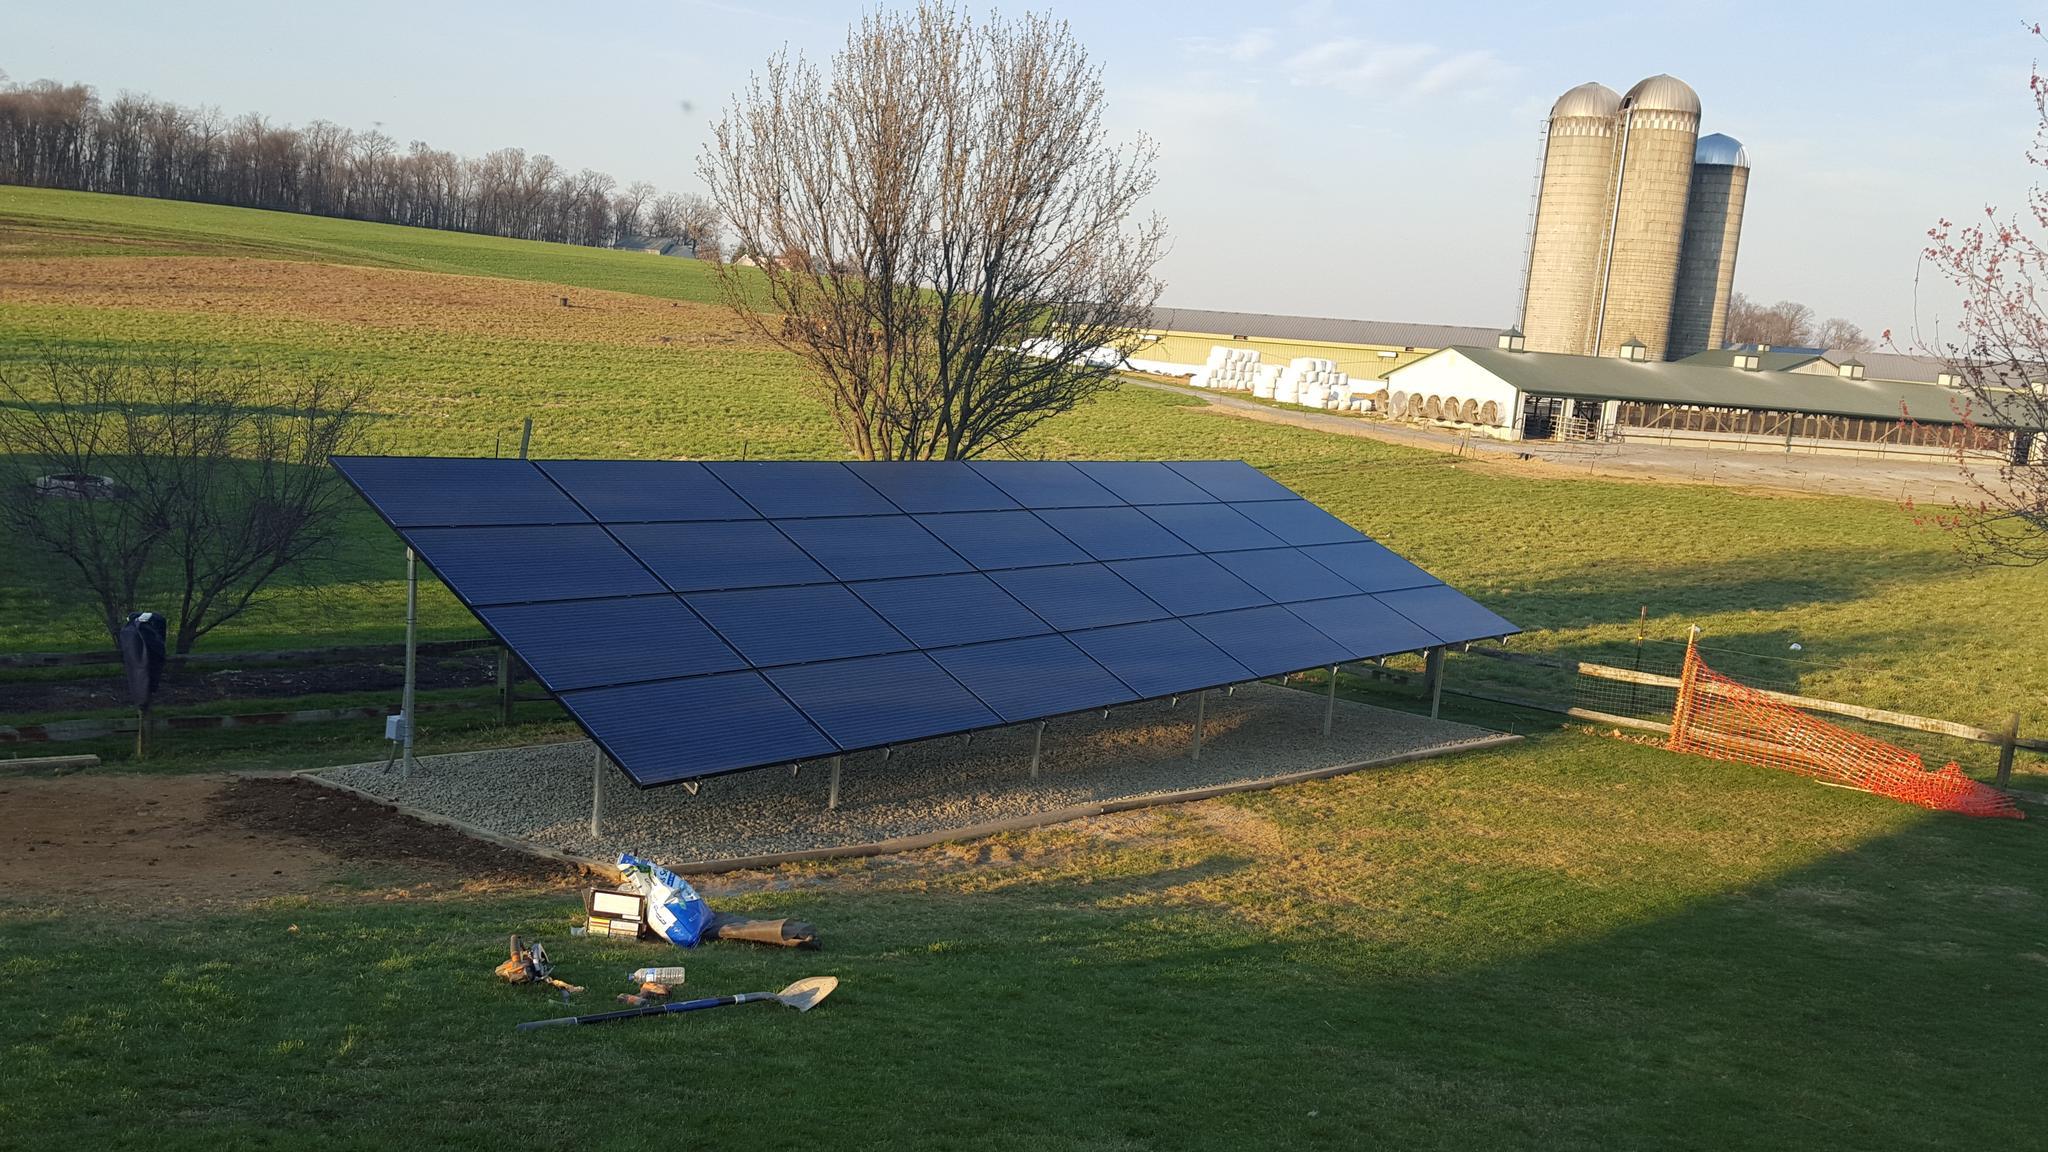 Brighteye Solar Llc Profile And Reviews 2020 Energysage